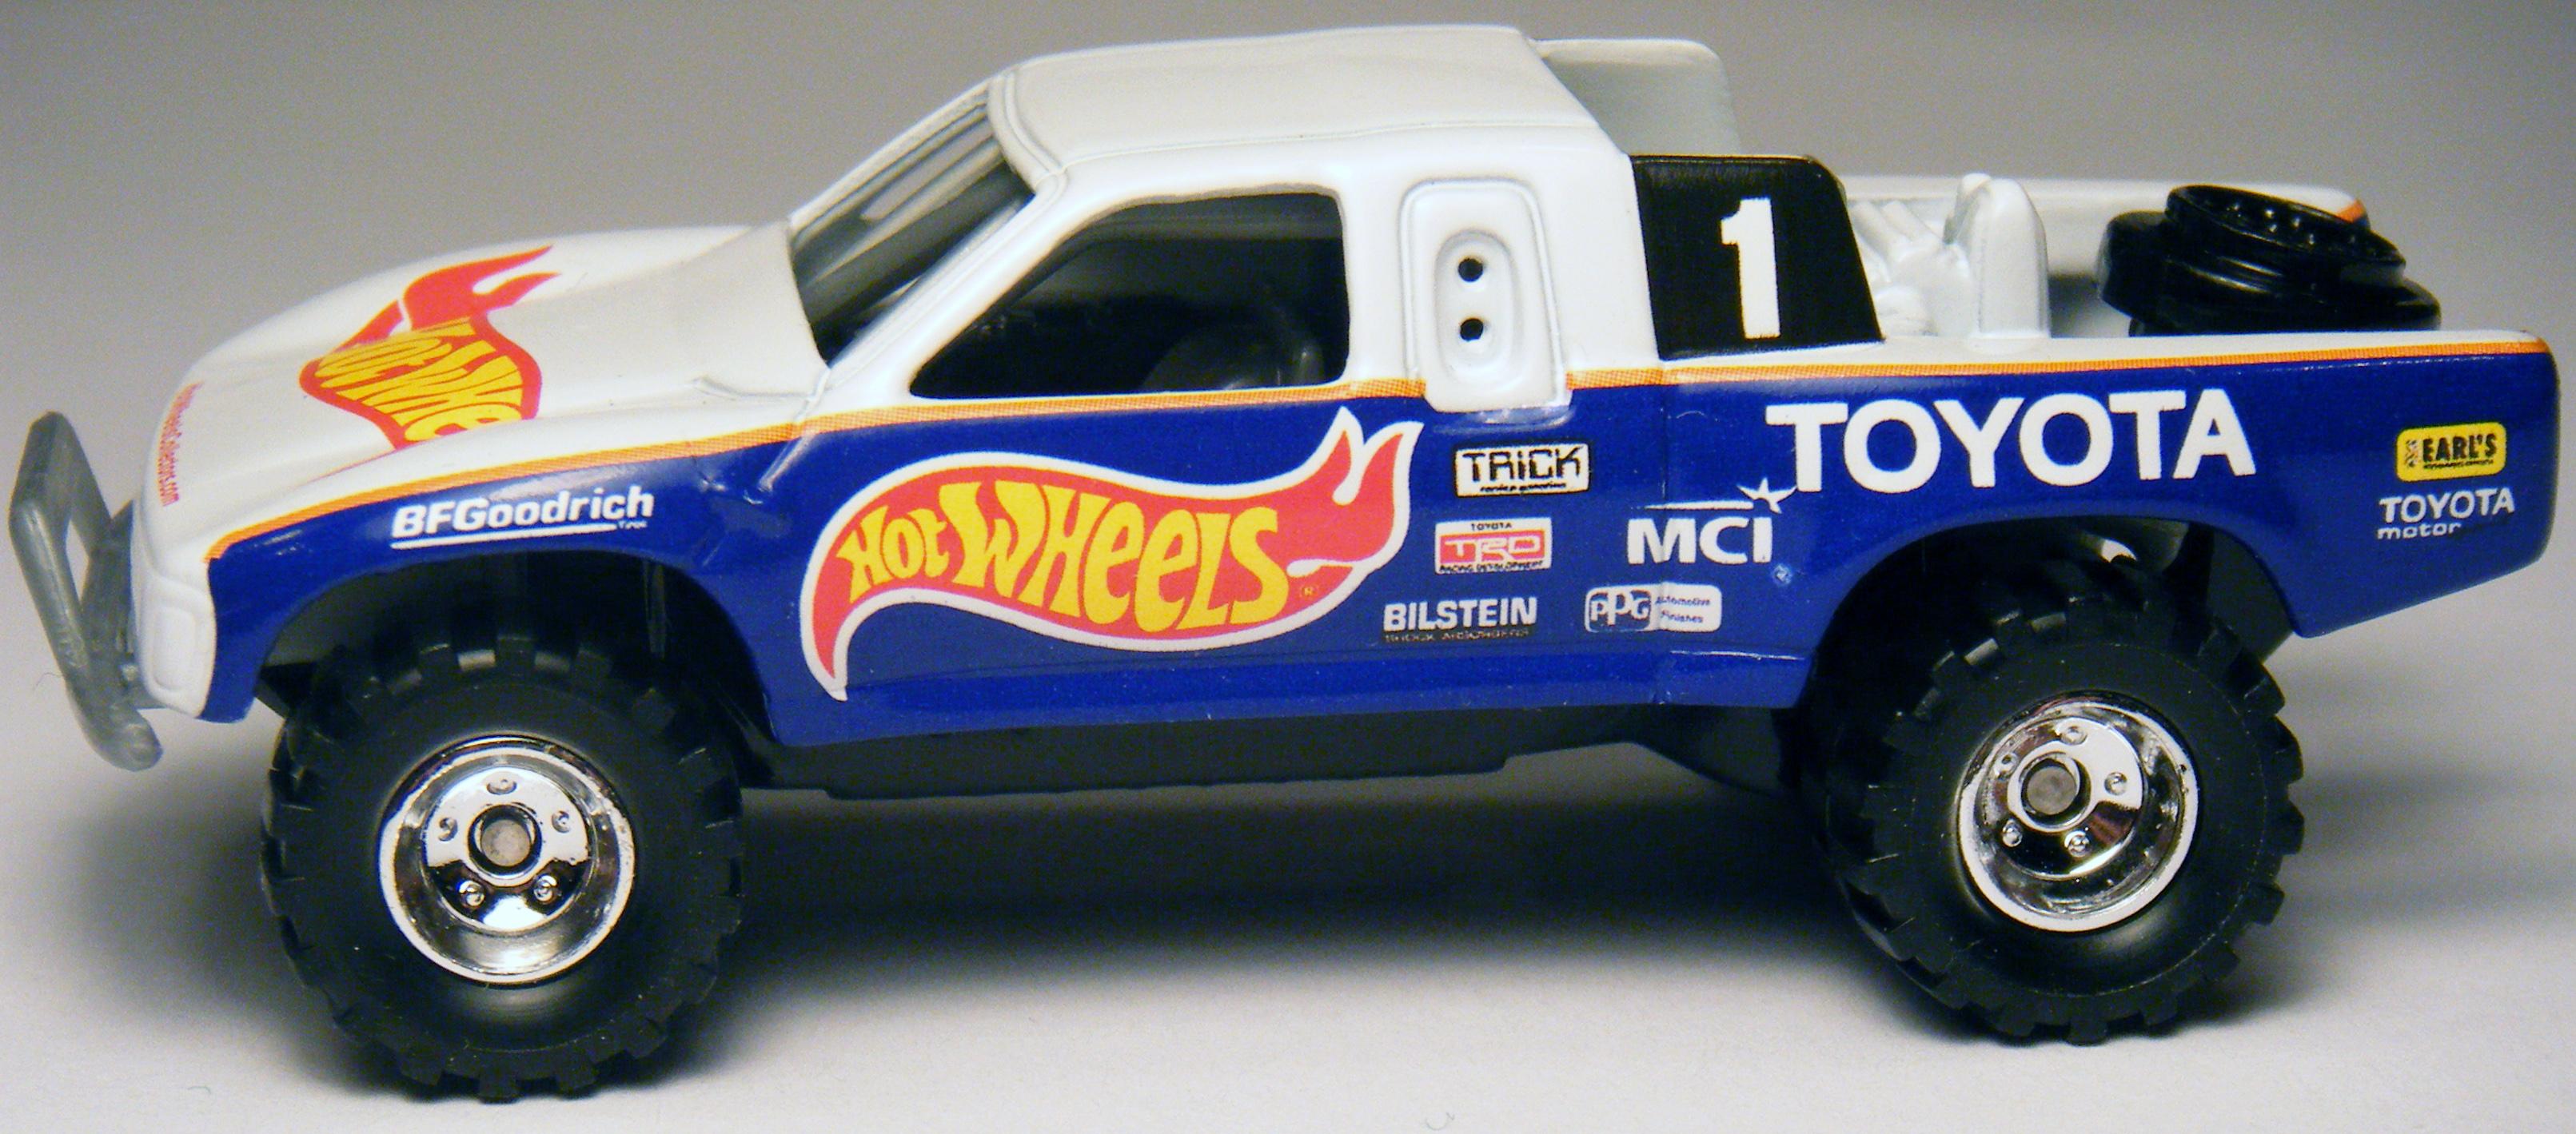 Toyota Baja Truck - Hot Wheels Wiki